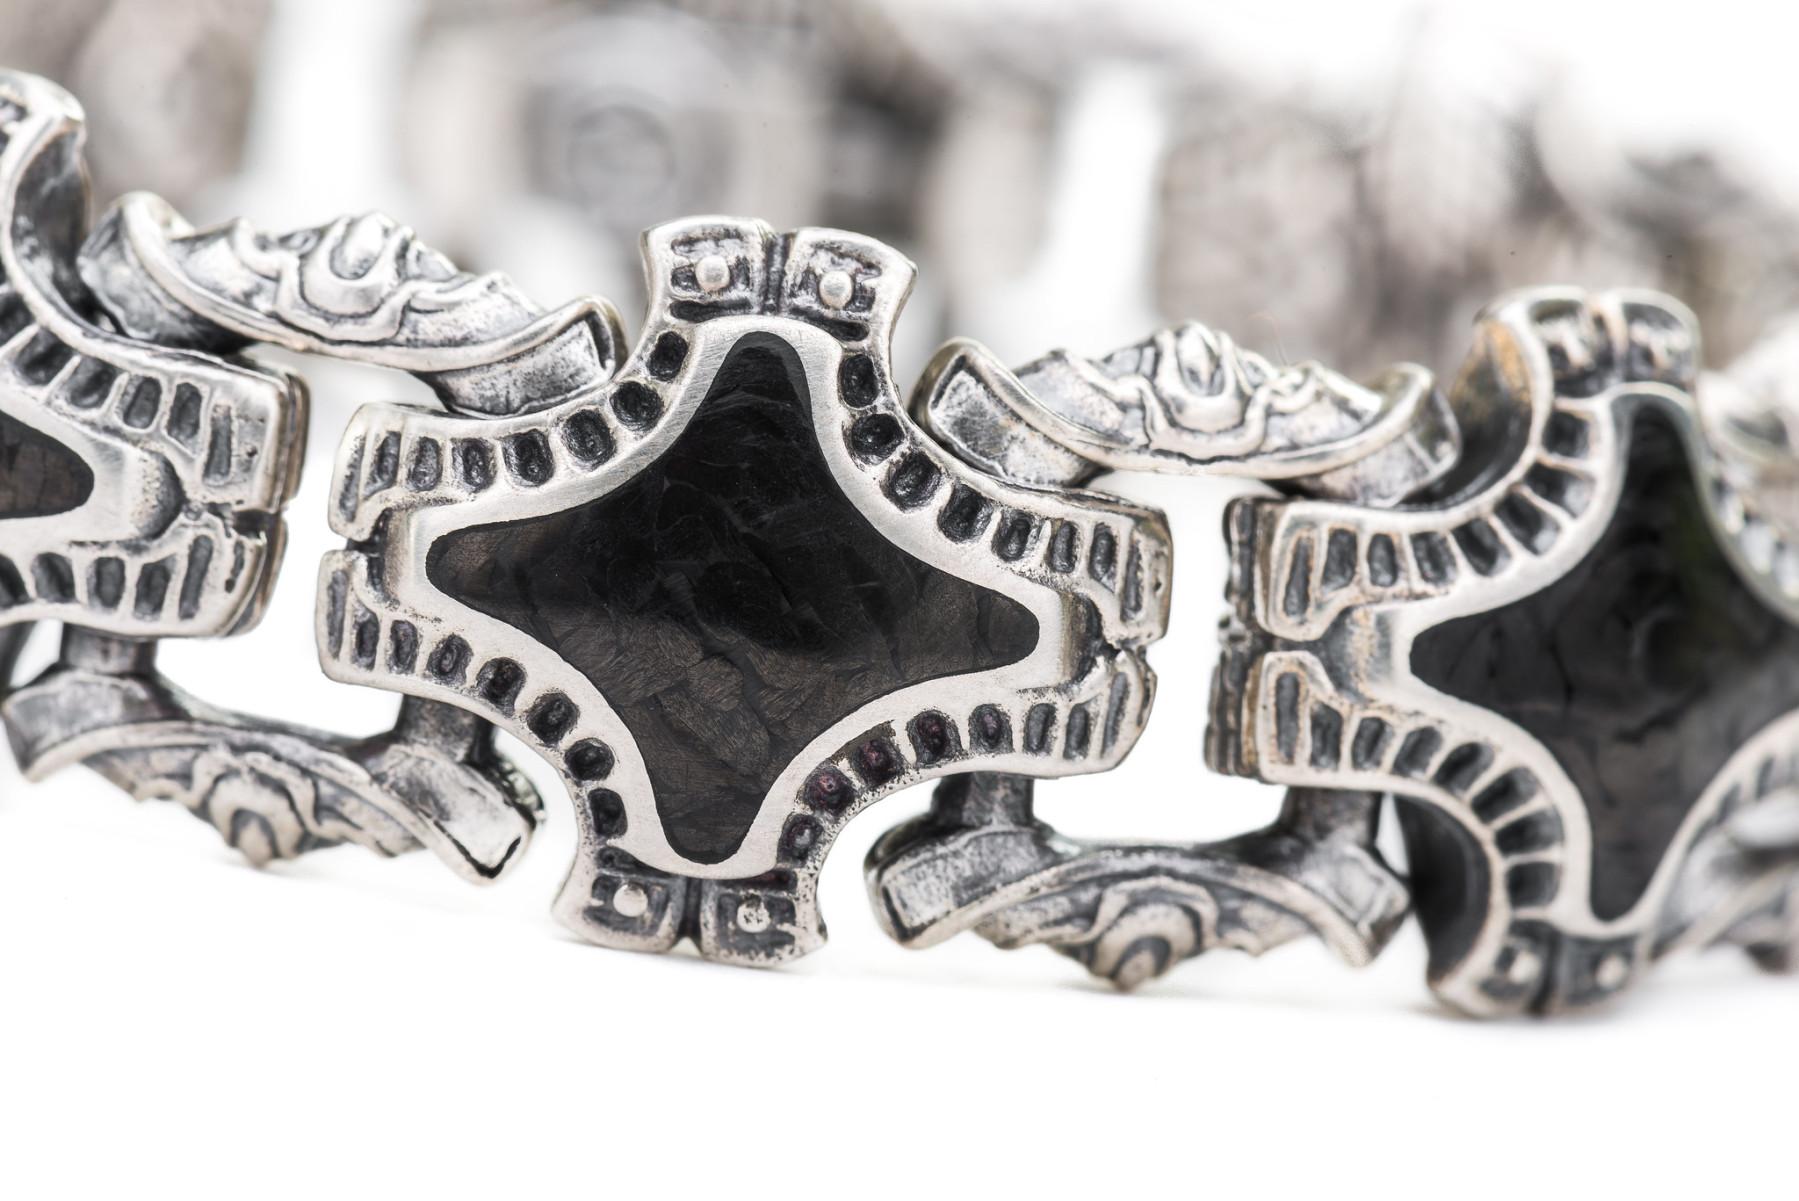 William Henry Carbon Fiber Silver Link Bracelet Closeup